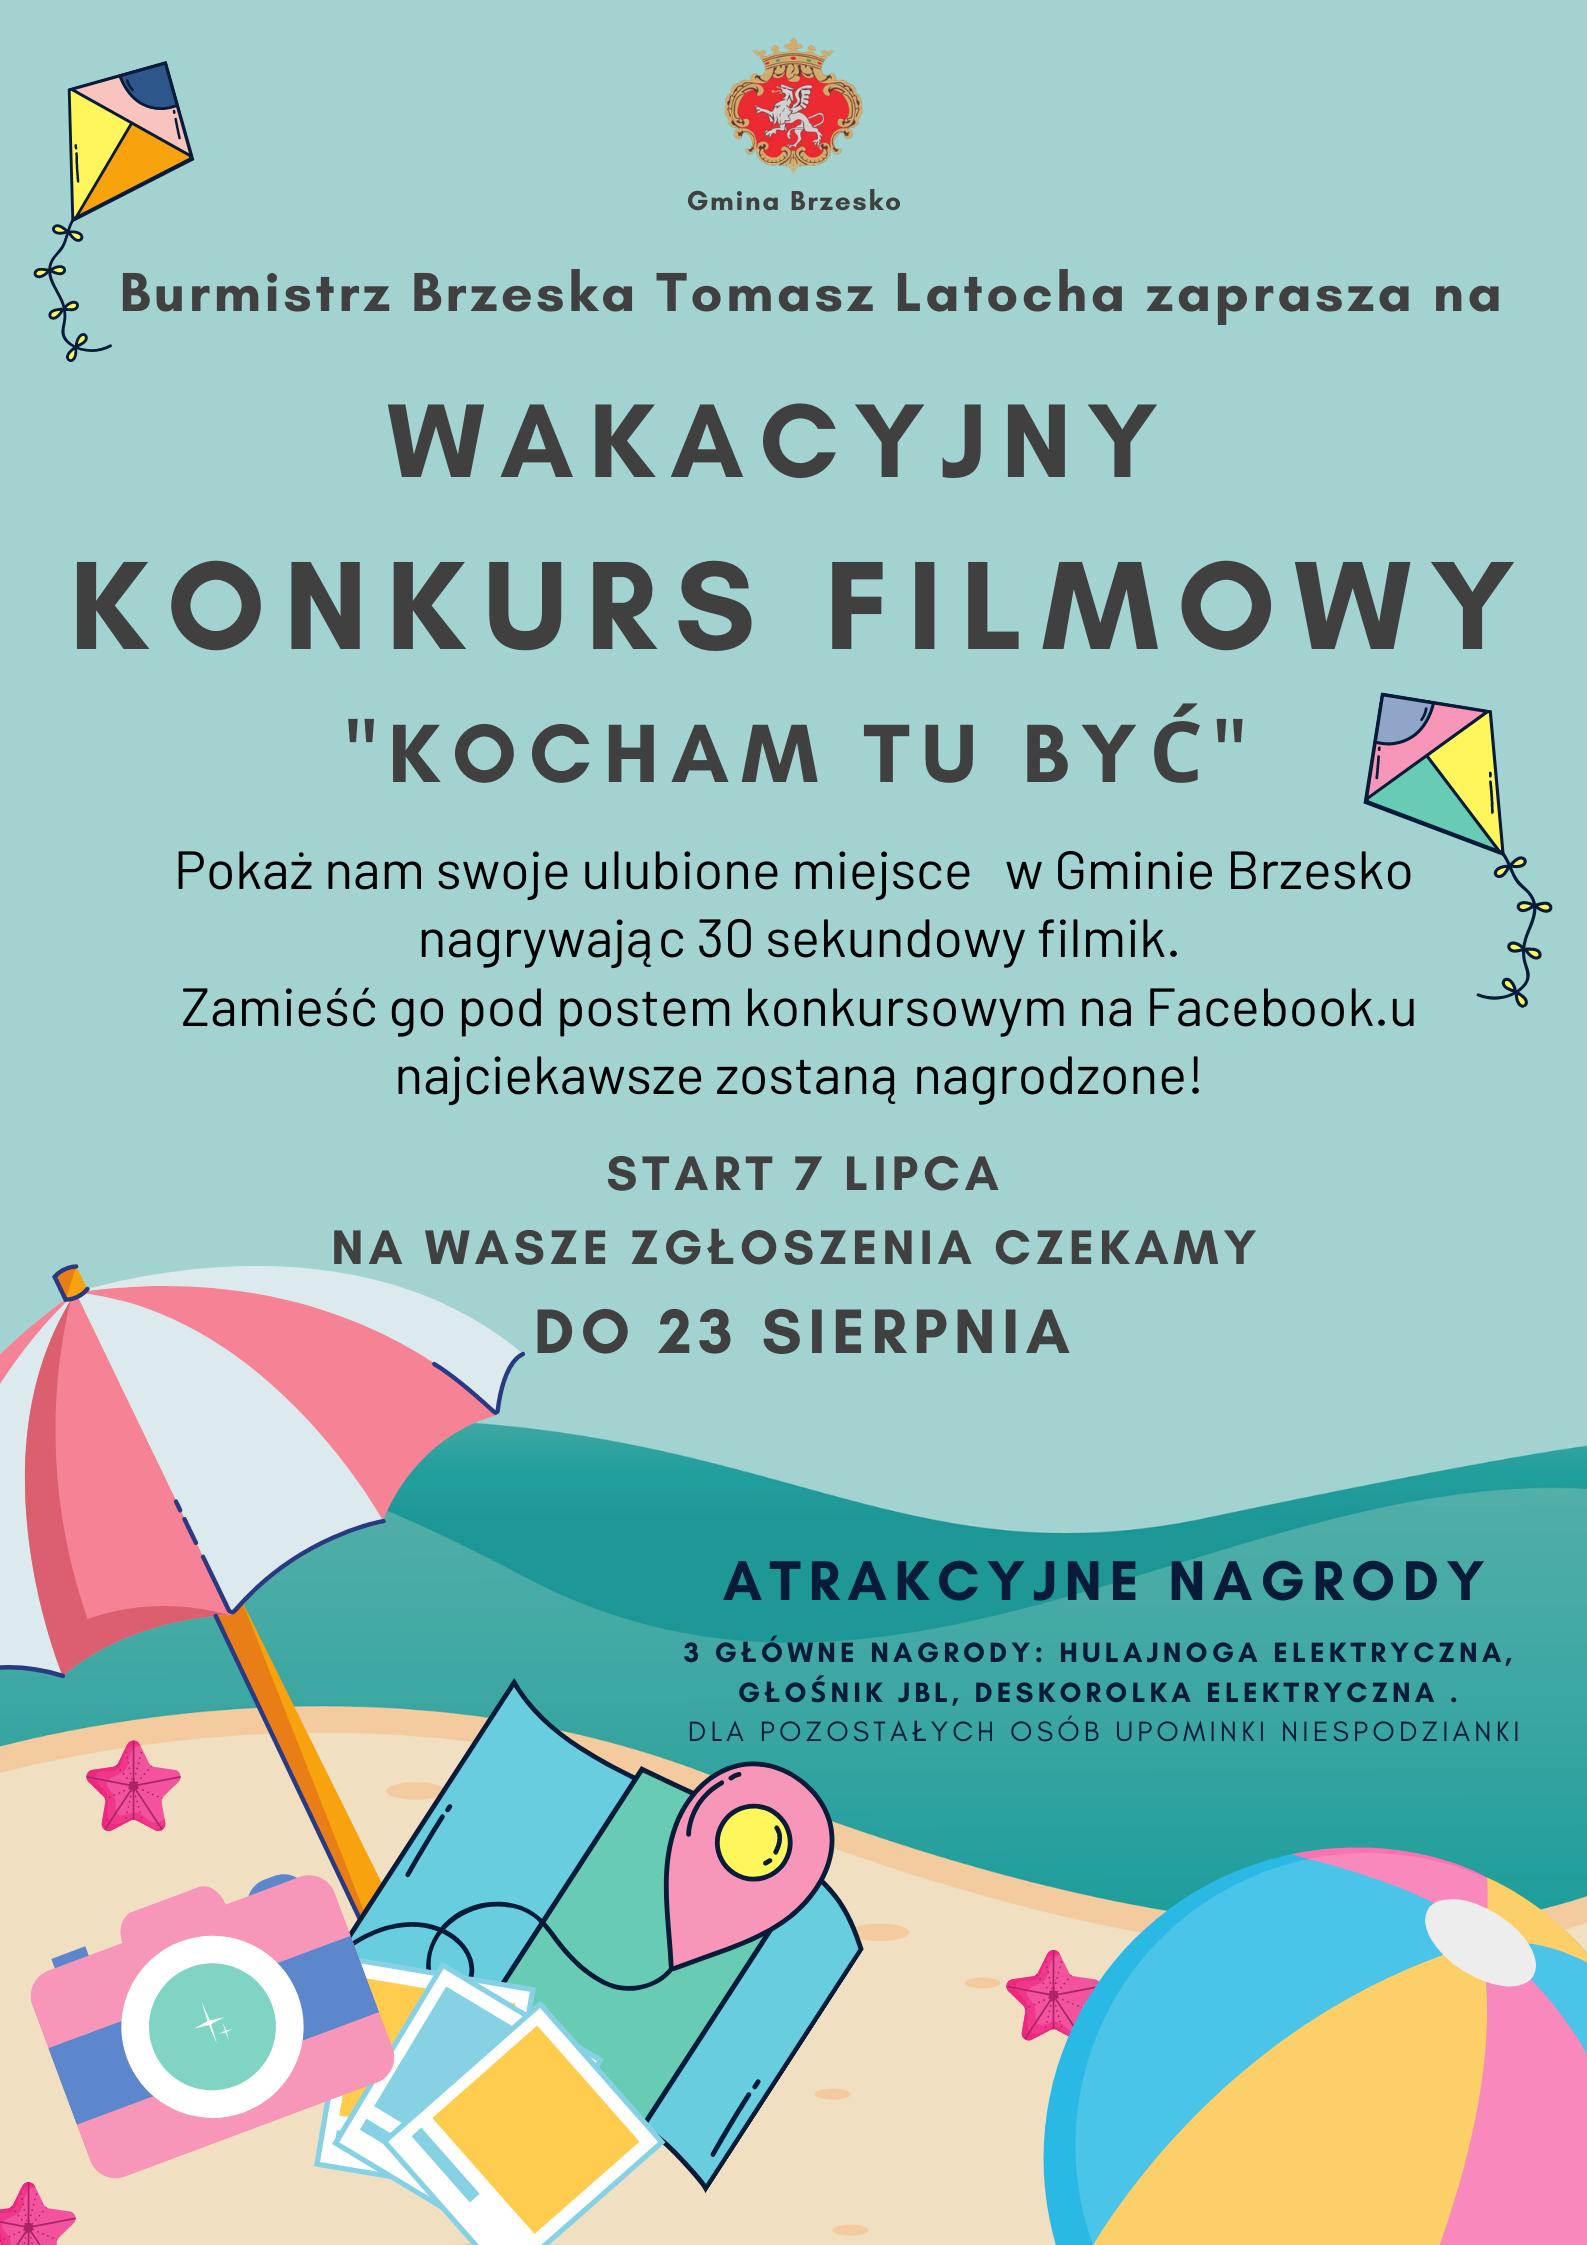 plakat-wakacyjny-konkurs.png